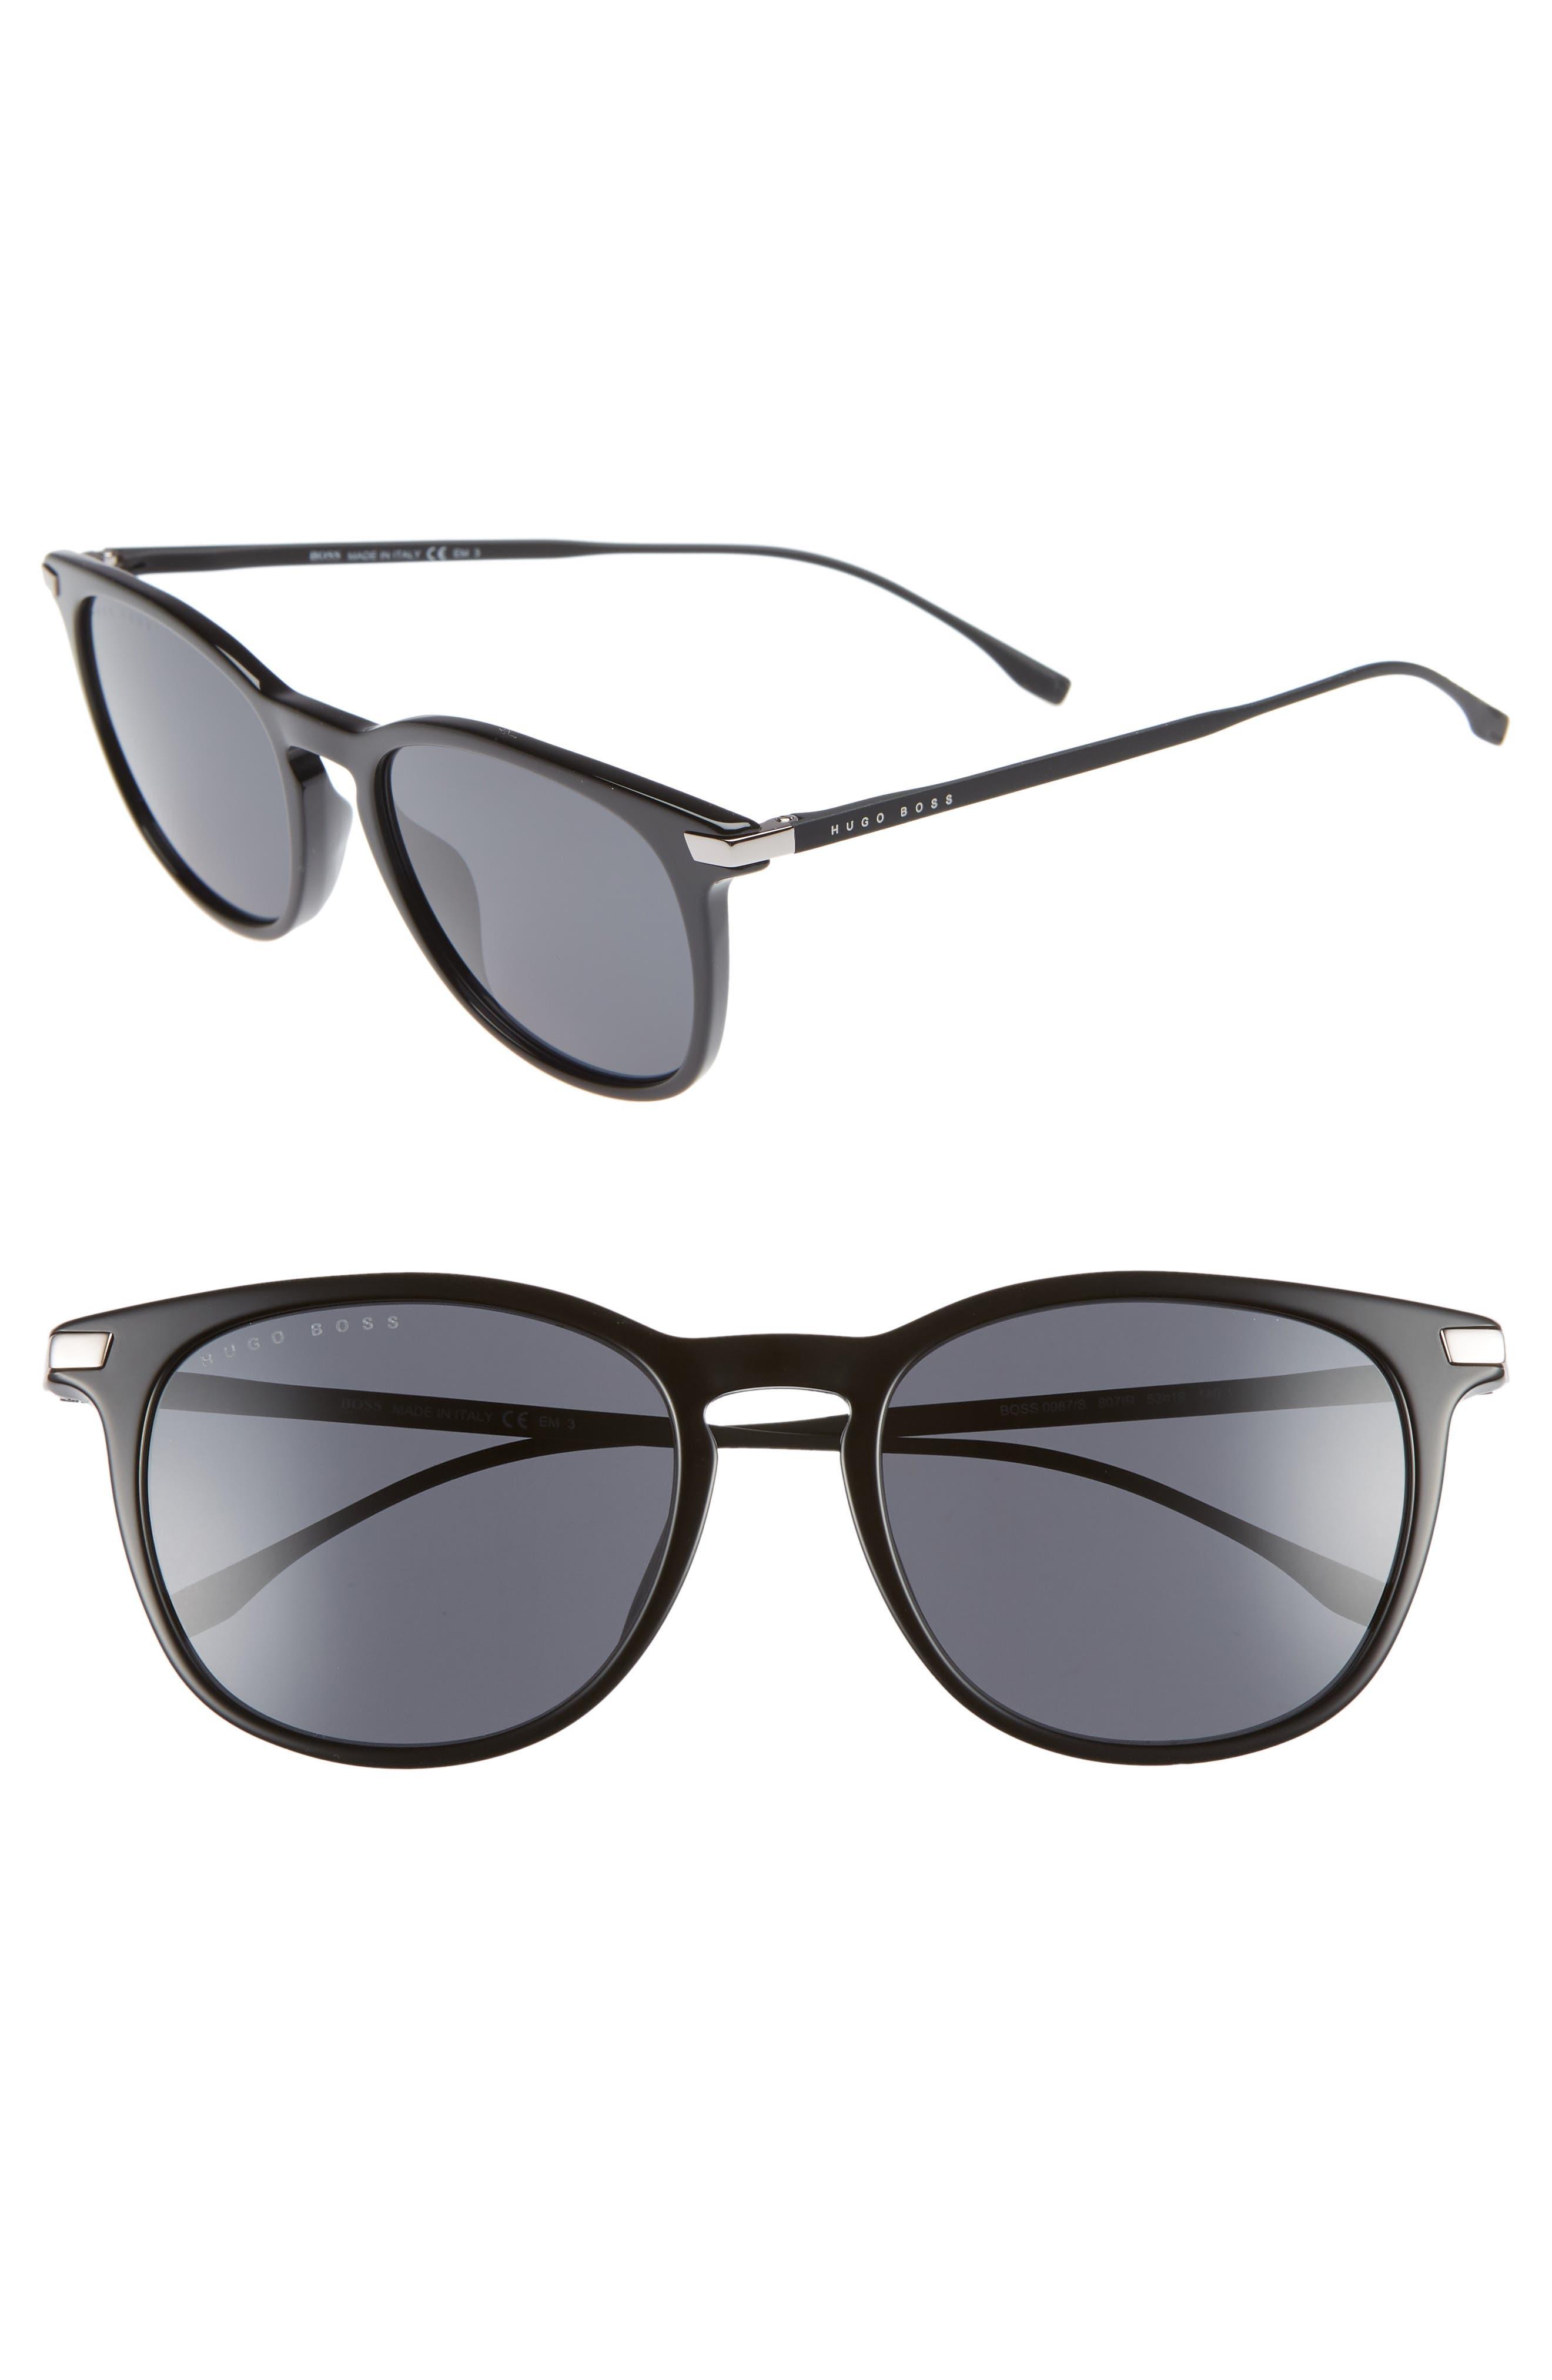 53mm Sunglasses,                             Main thumbnail 1, color,                             BLACK